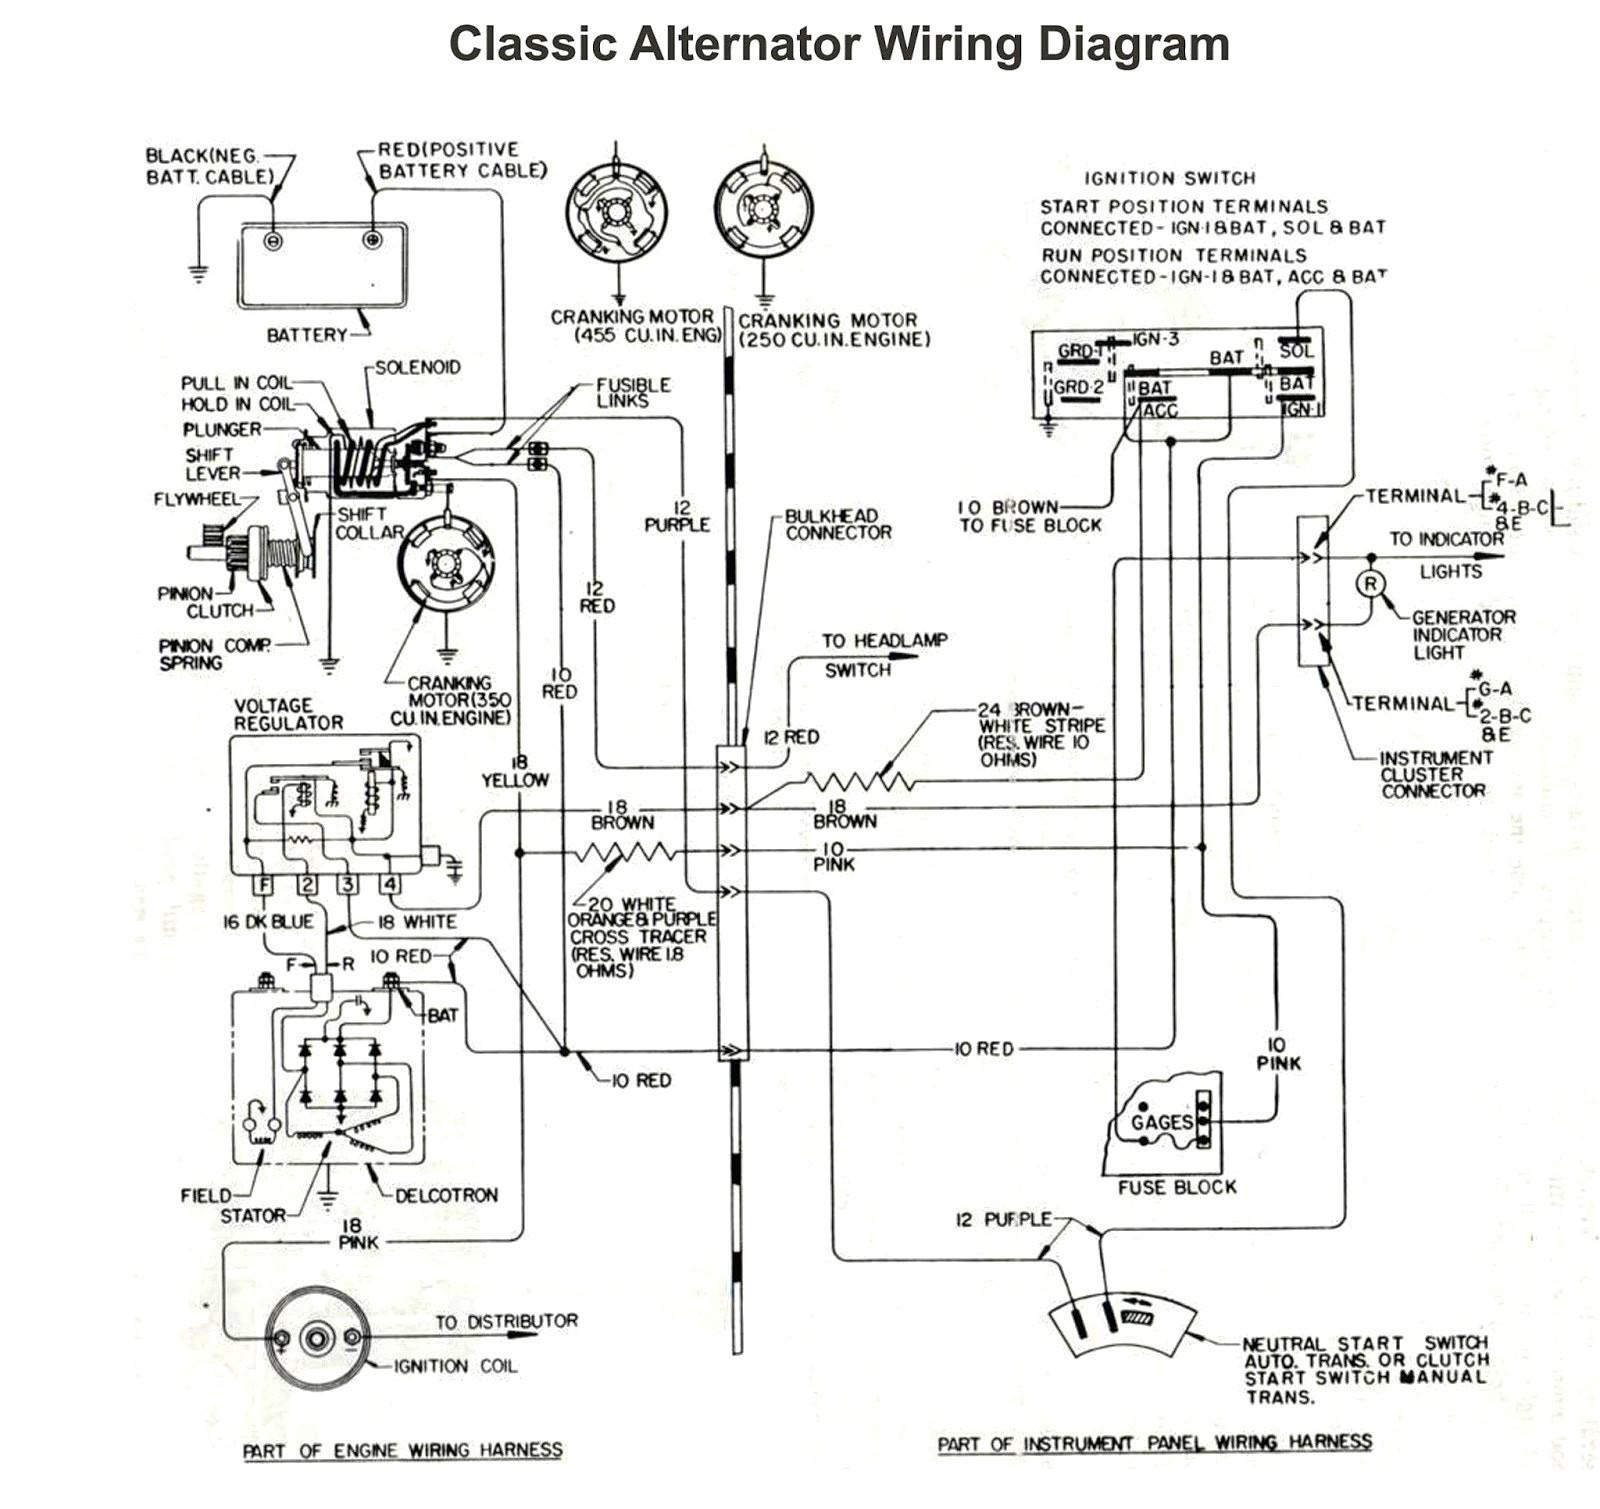 Ford Alternator Wiring Diagram Internal Regulator Inspirational - Ford Alternator Wiring Diagram Internal Regulator